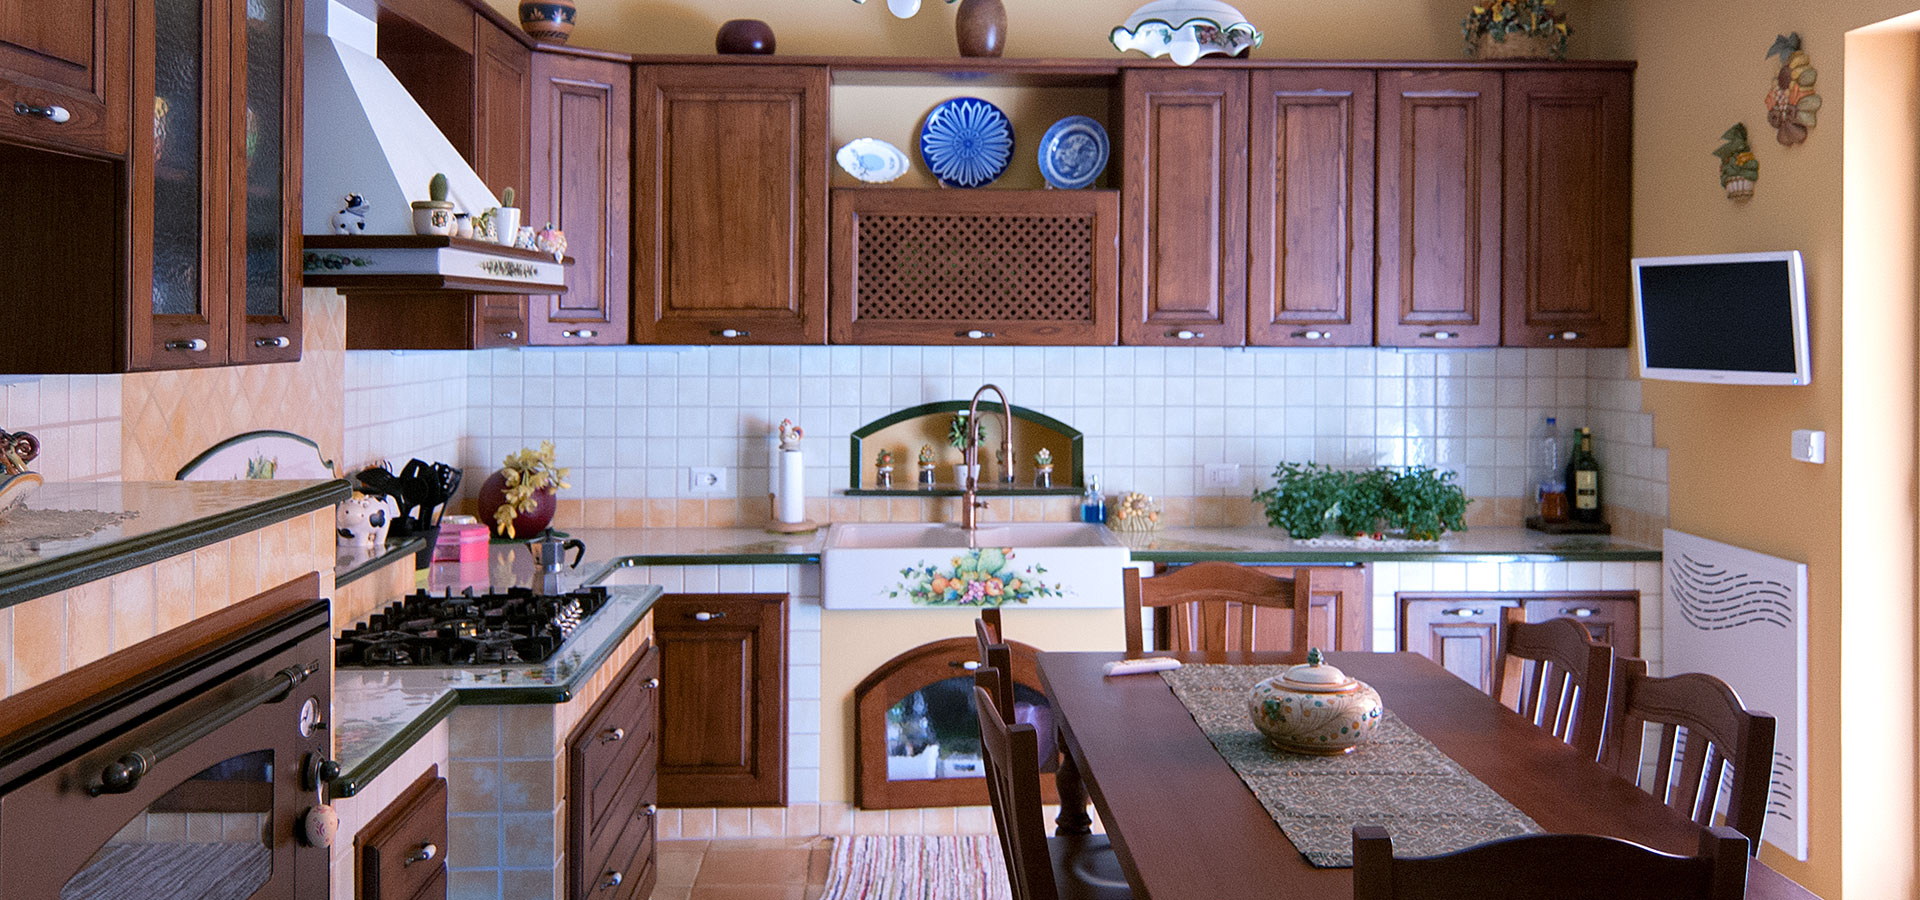 Cucine in muratura smontabile modello pescara artesole - Arte sole cucine ...